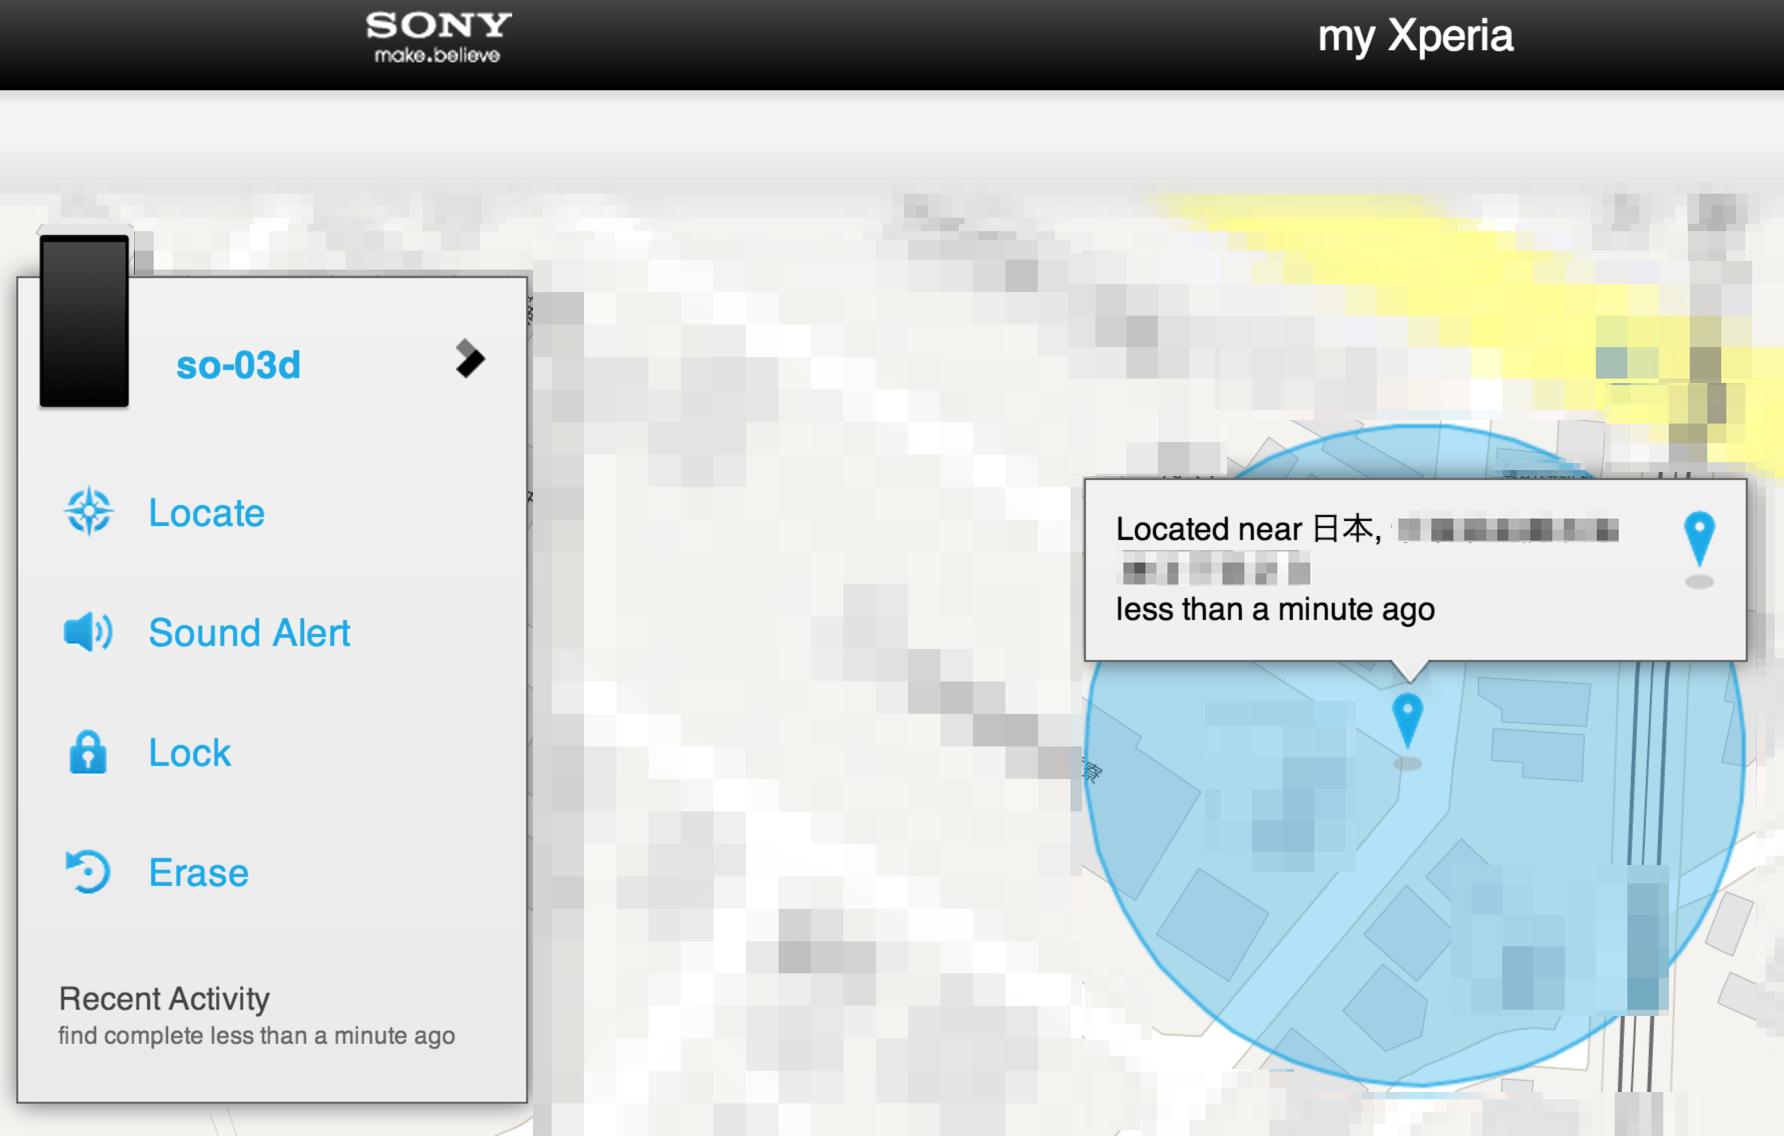 Xperiaをリモートロックできるセキュリティアプリ「my Xperia」を使ってみた!